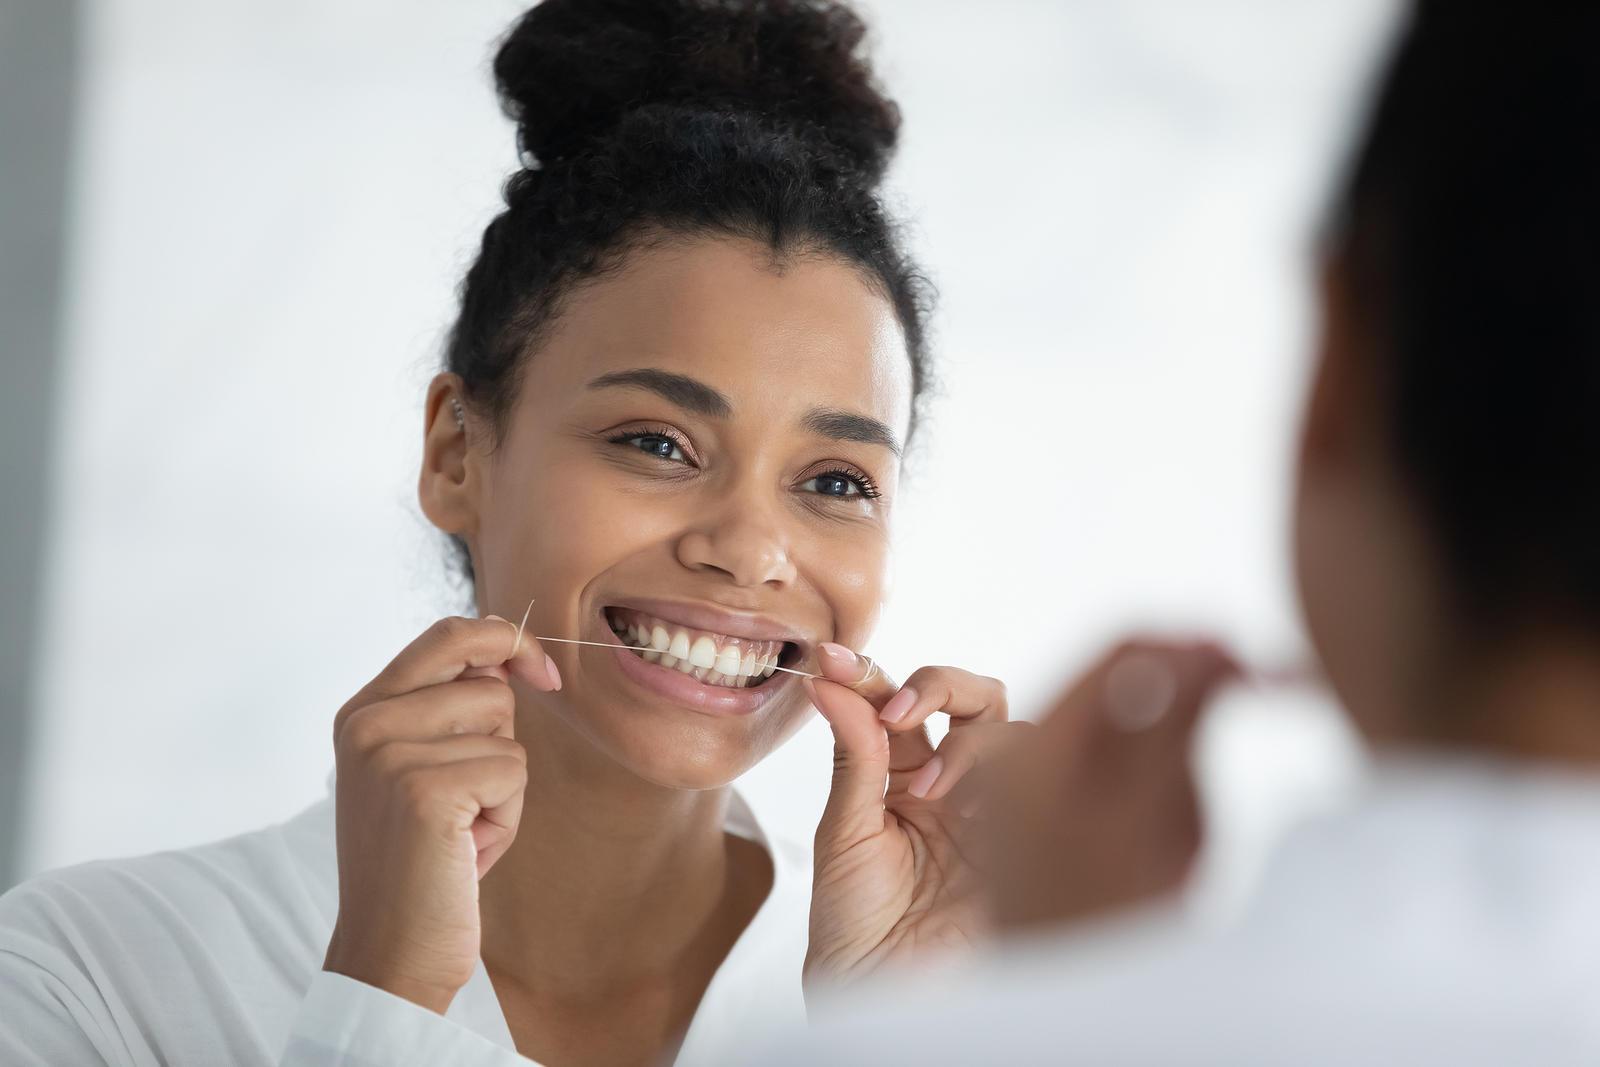 Woman-flossing